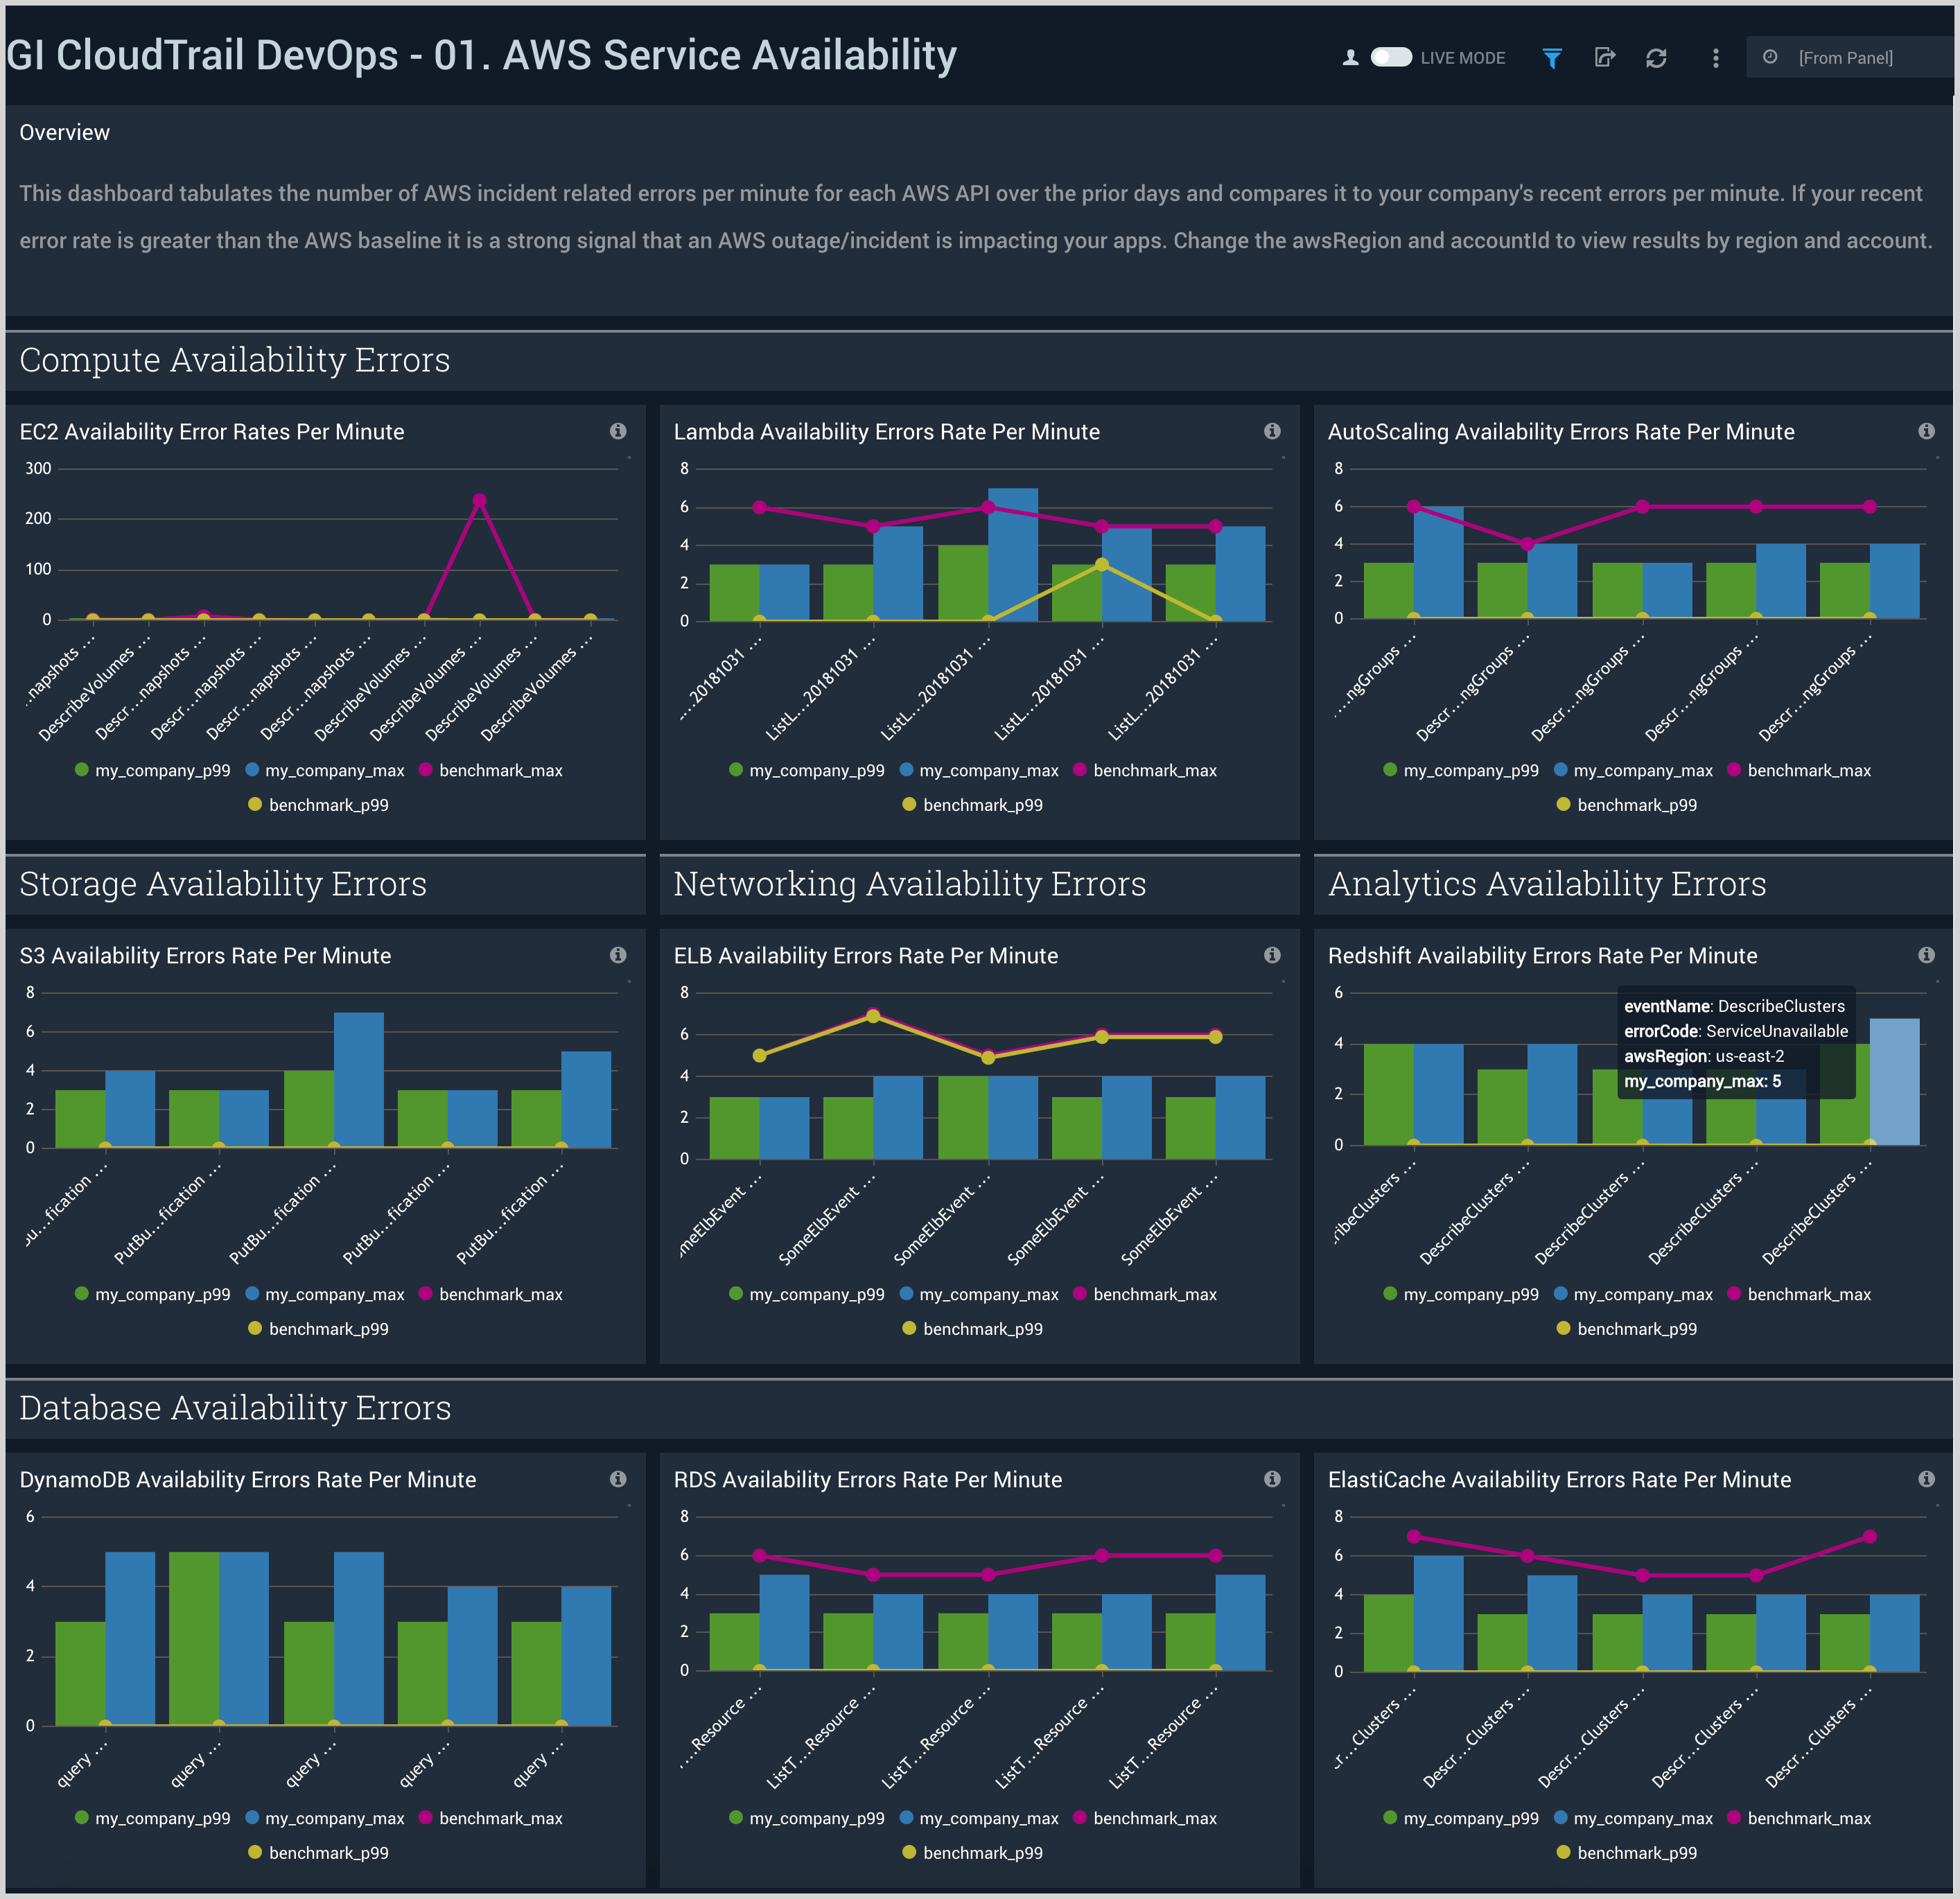 Global Intelligence for AWS CloudTrail DevOps